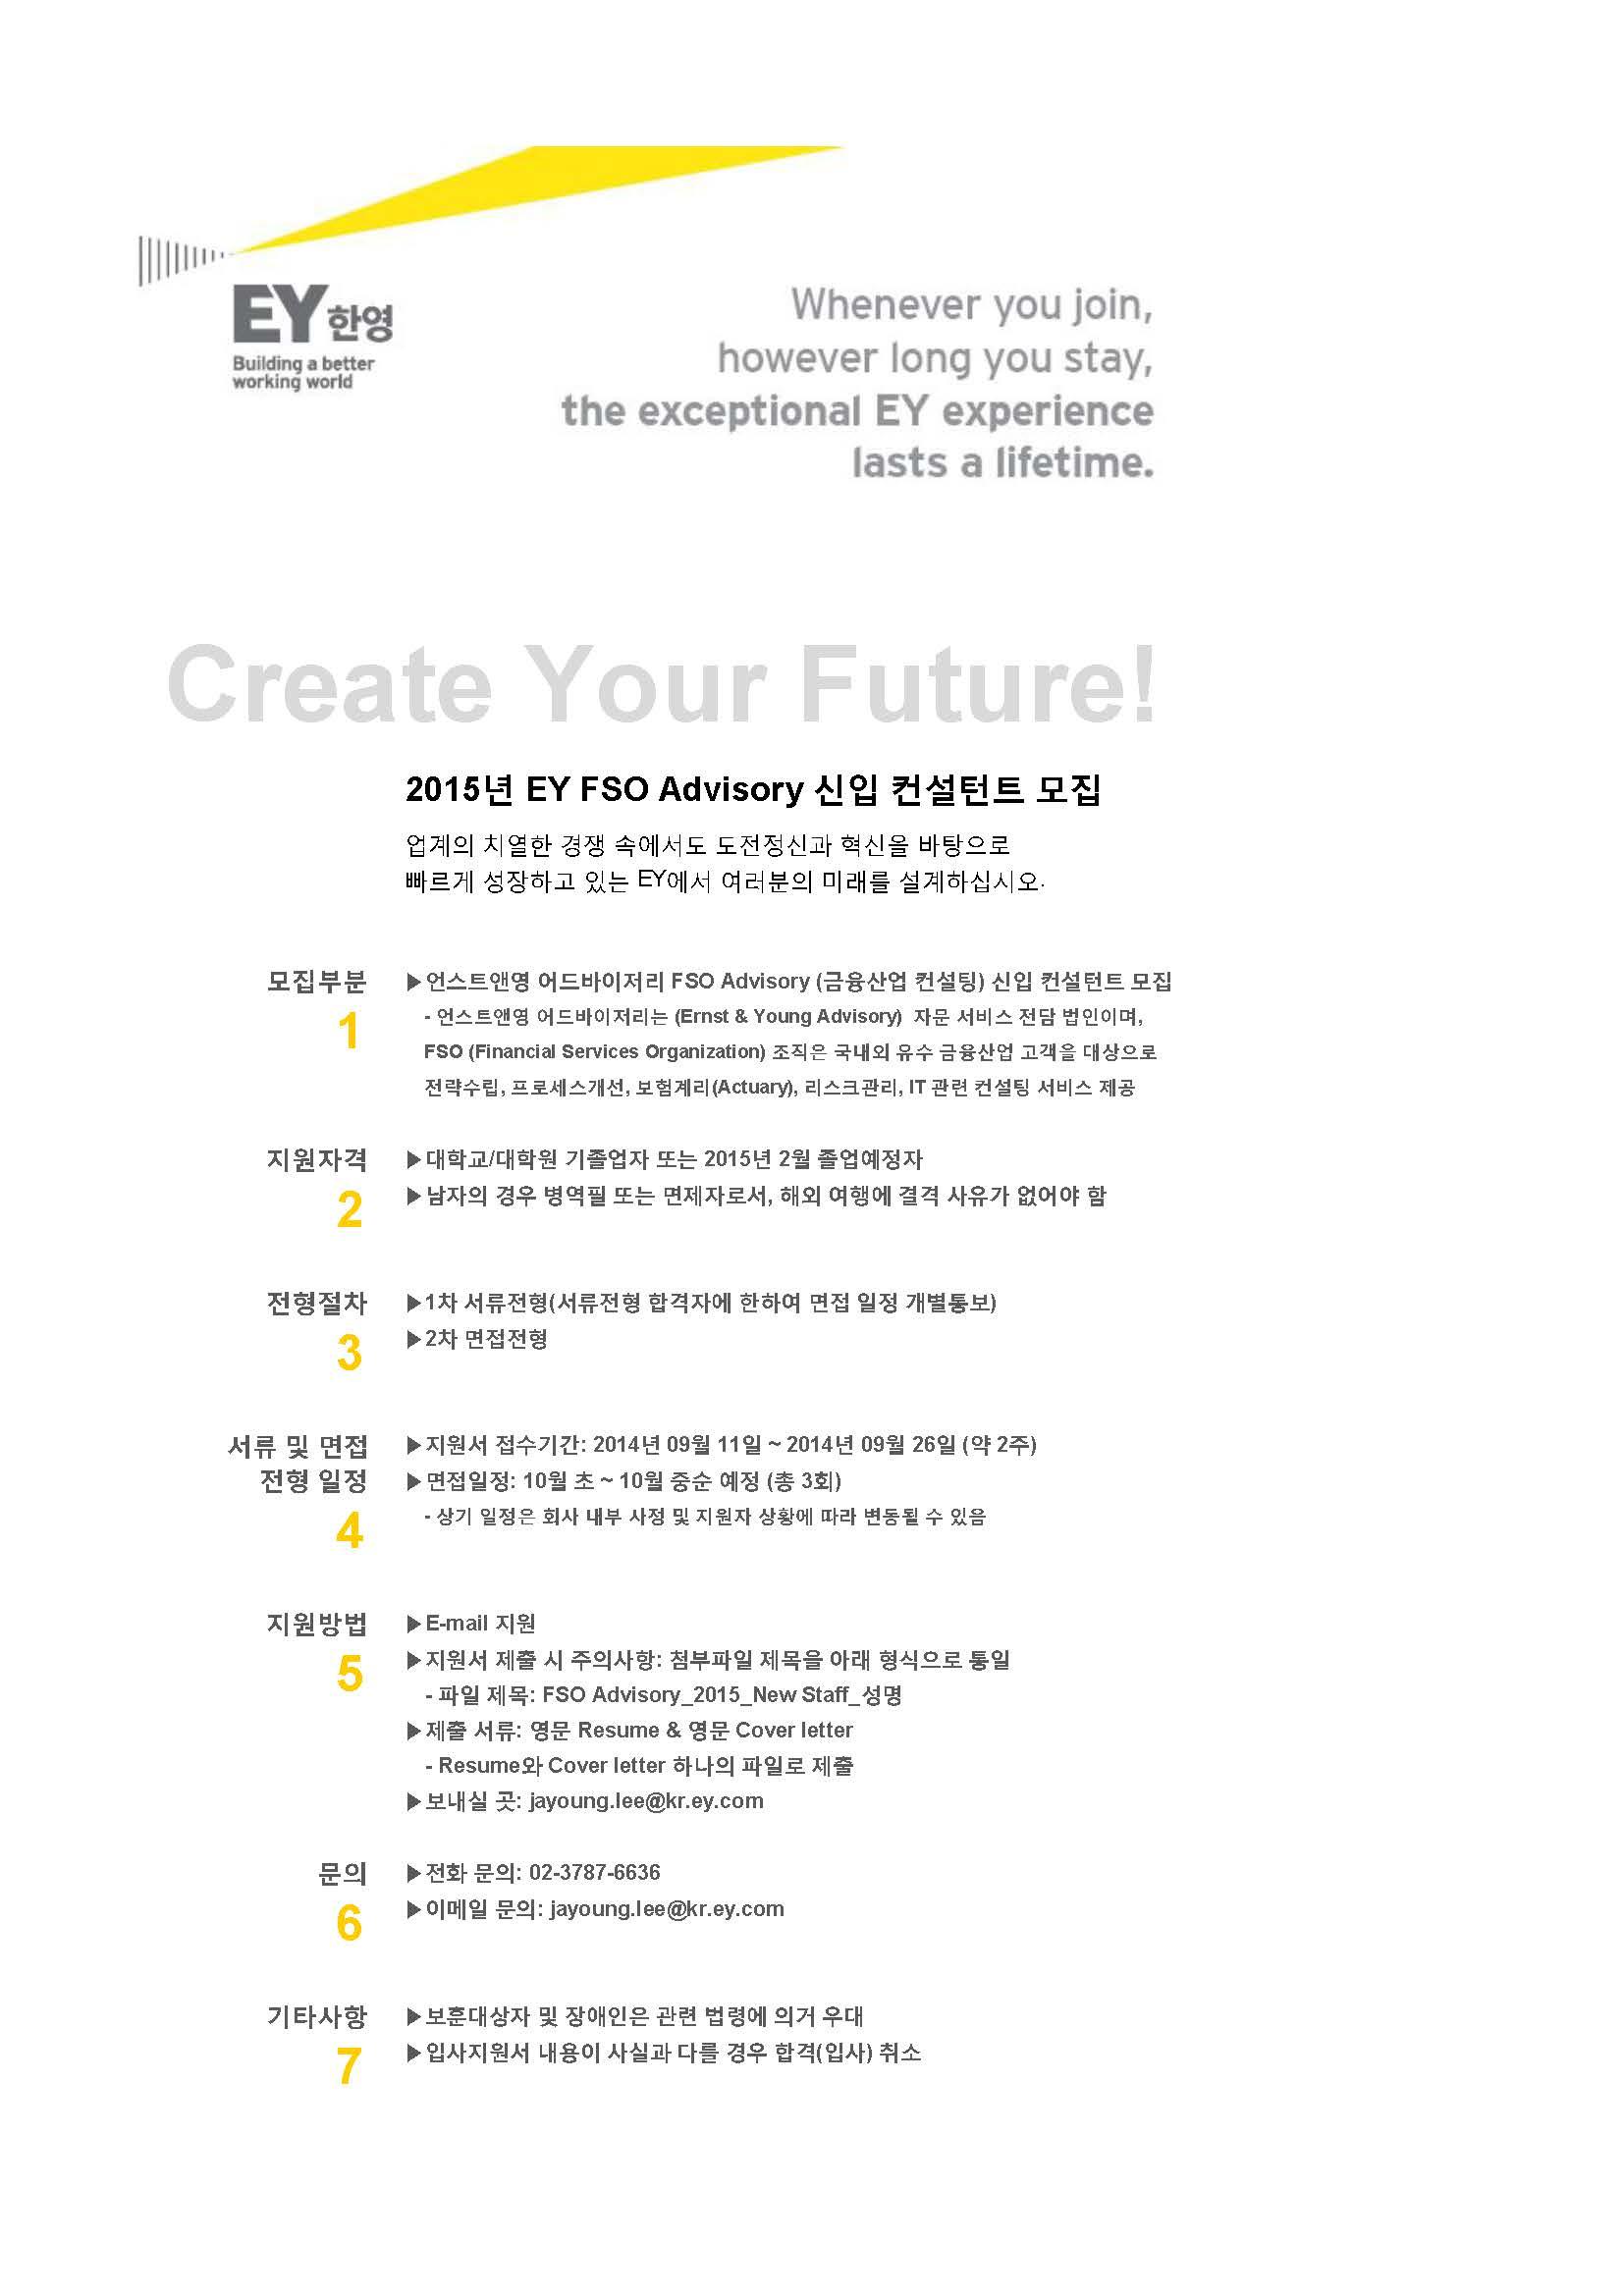 EY FSO Advisory 신입 컨설턴트 모집